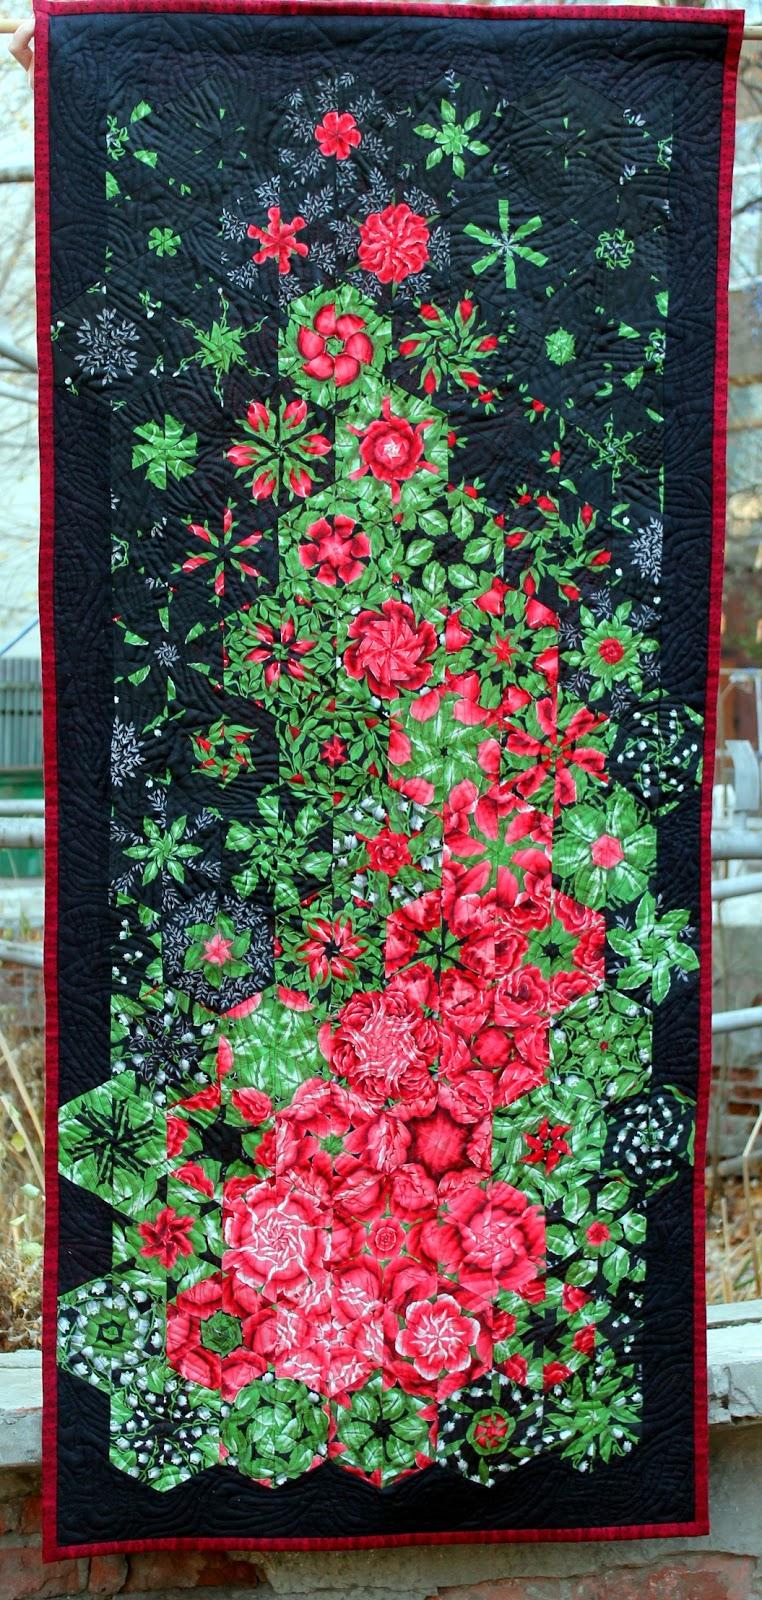 Quilt Art By Olena Pugachova Gallery